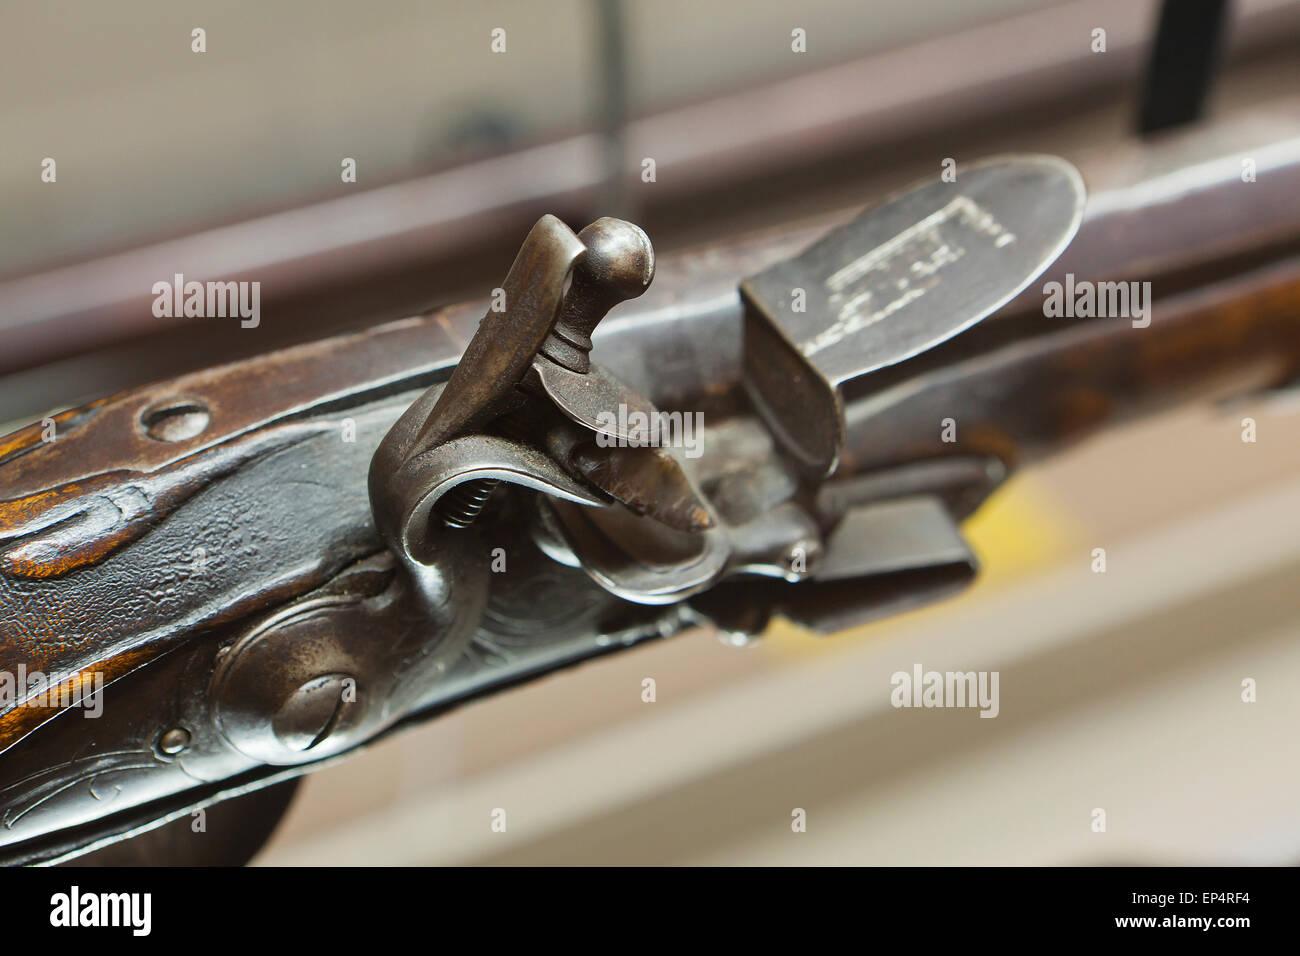 Flintlock mechanism on early 19th century American rifle (musket gun) - USA - Stock Image